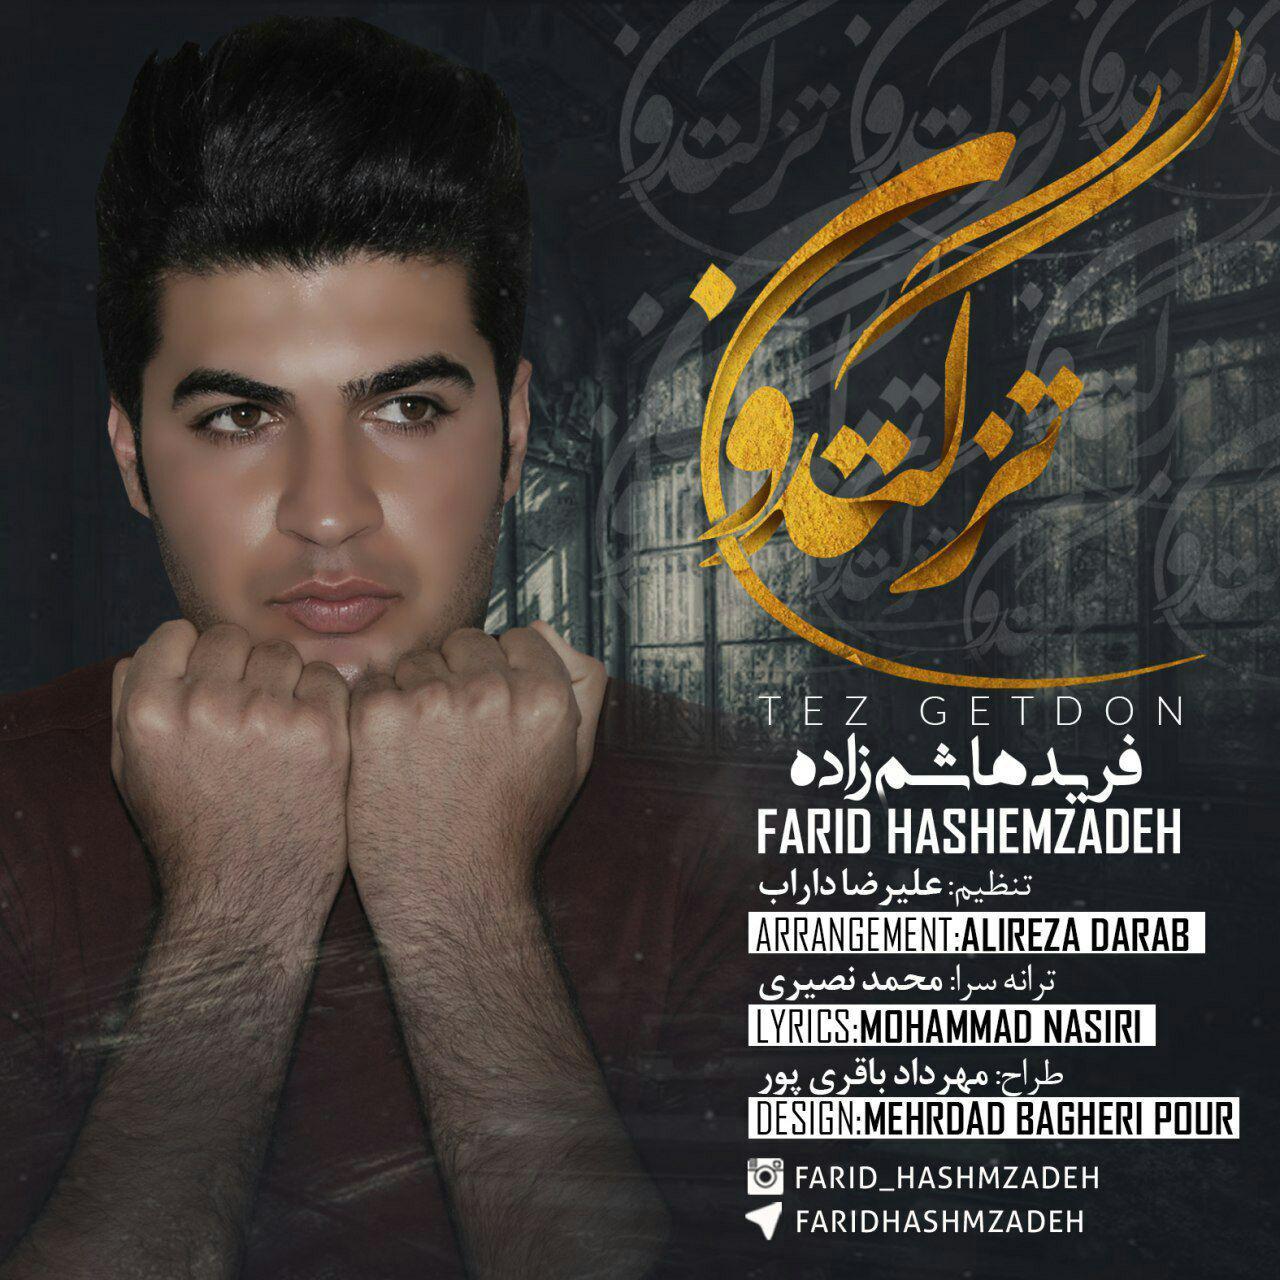 http://s8.picofile.com/file/8322504318/13Farid_Hashemzadeh_Tez_Getdun.jpg